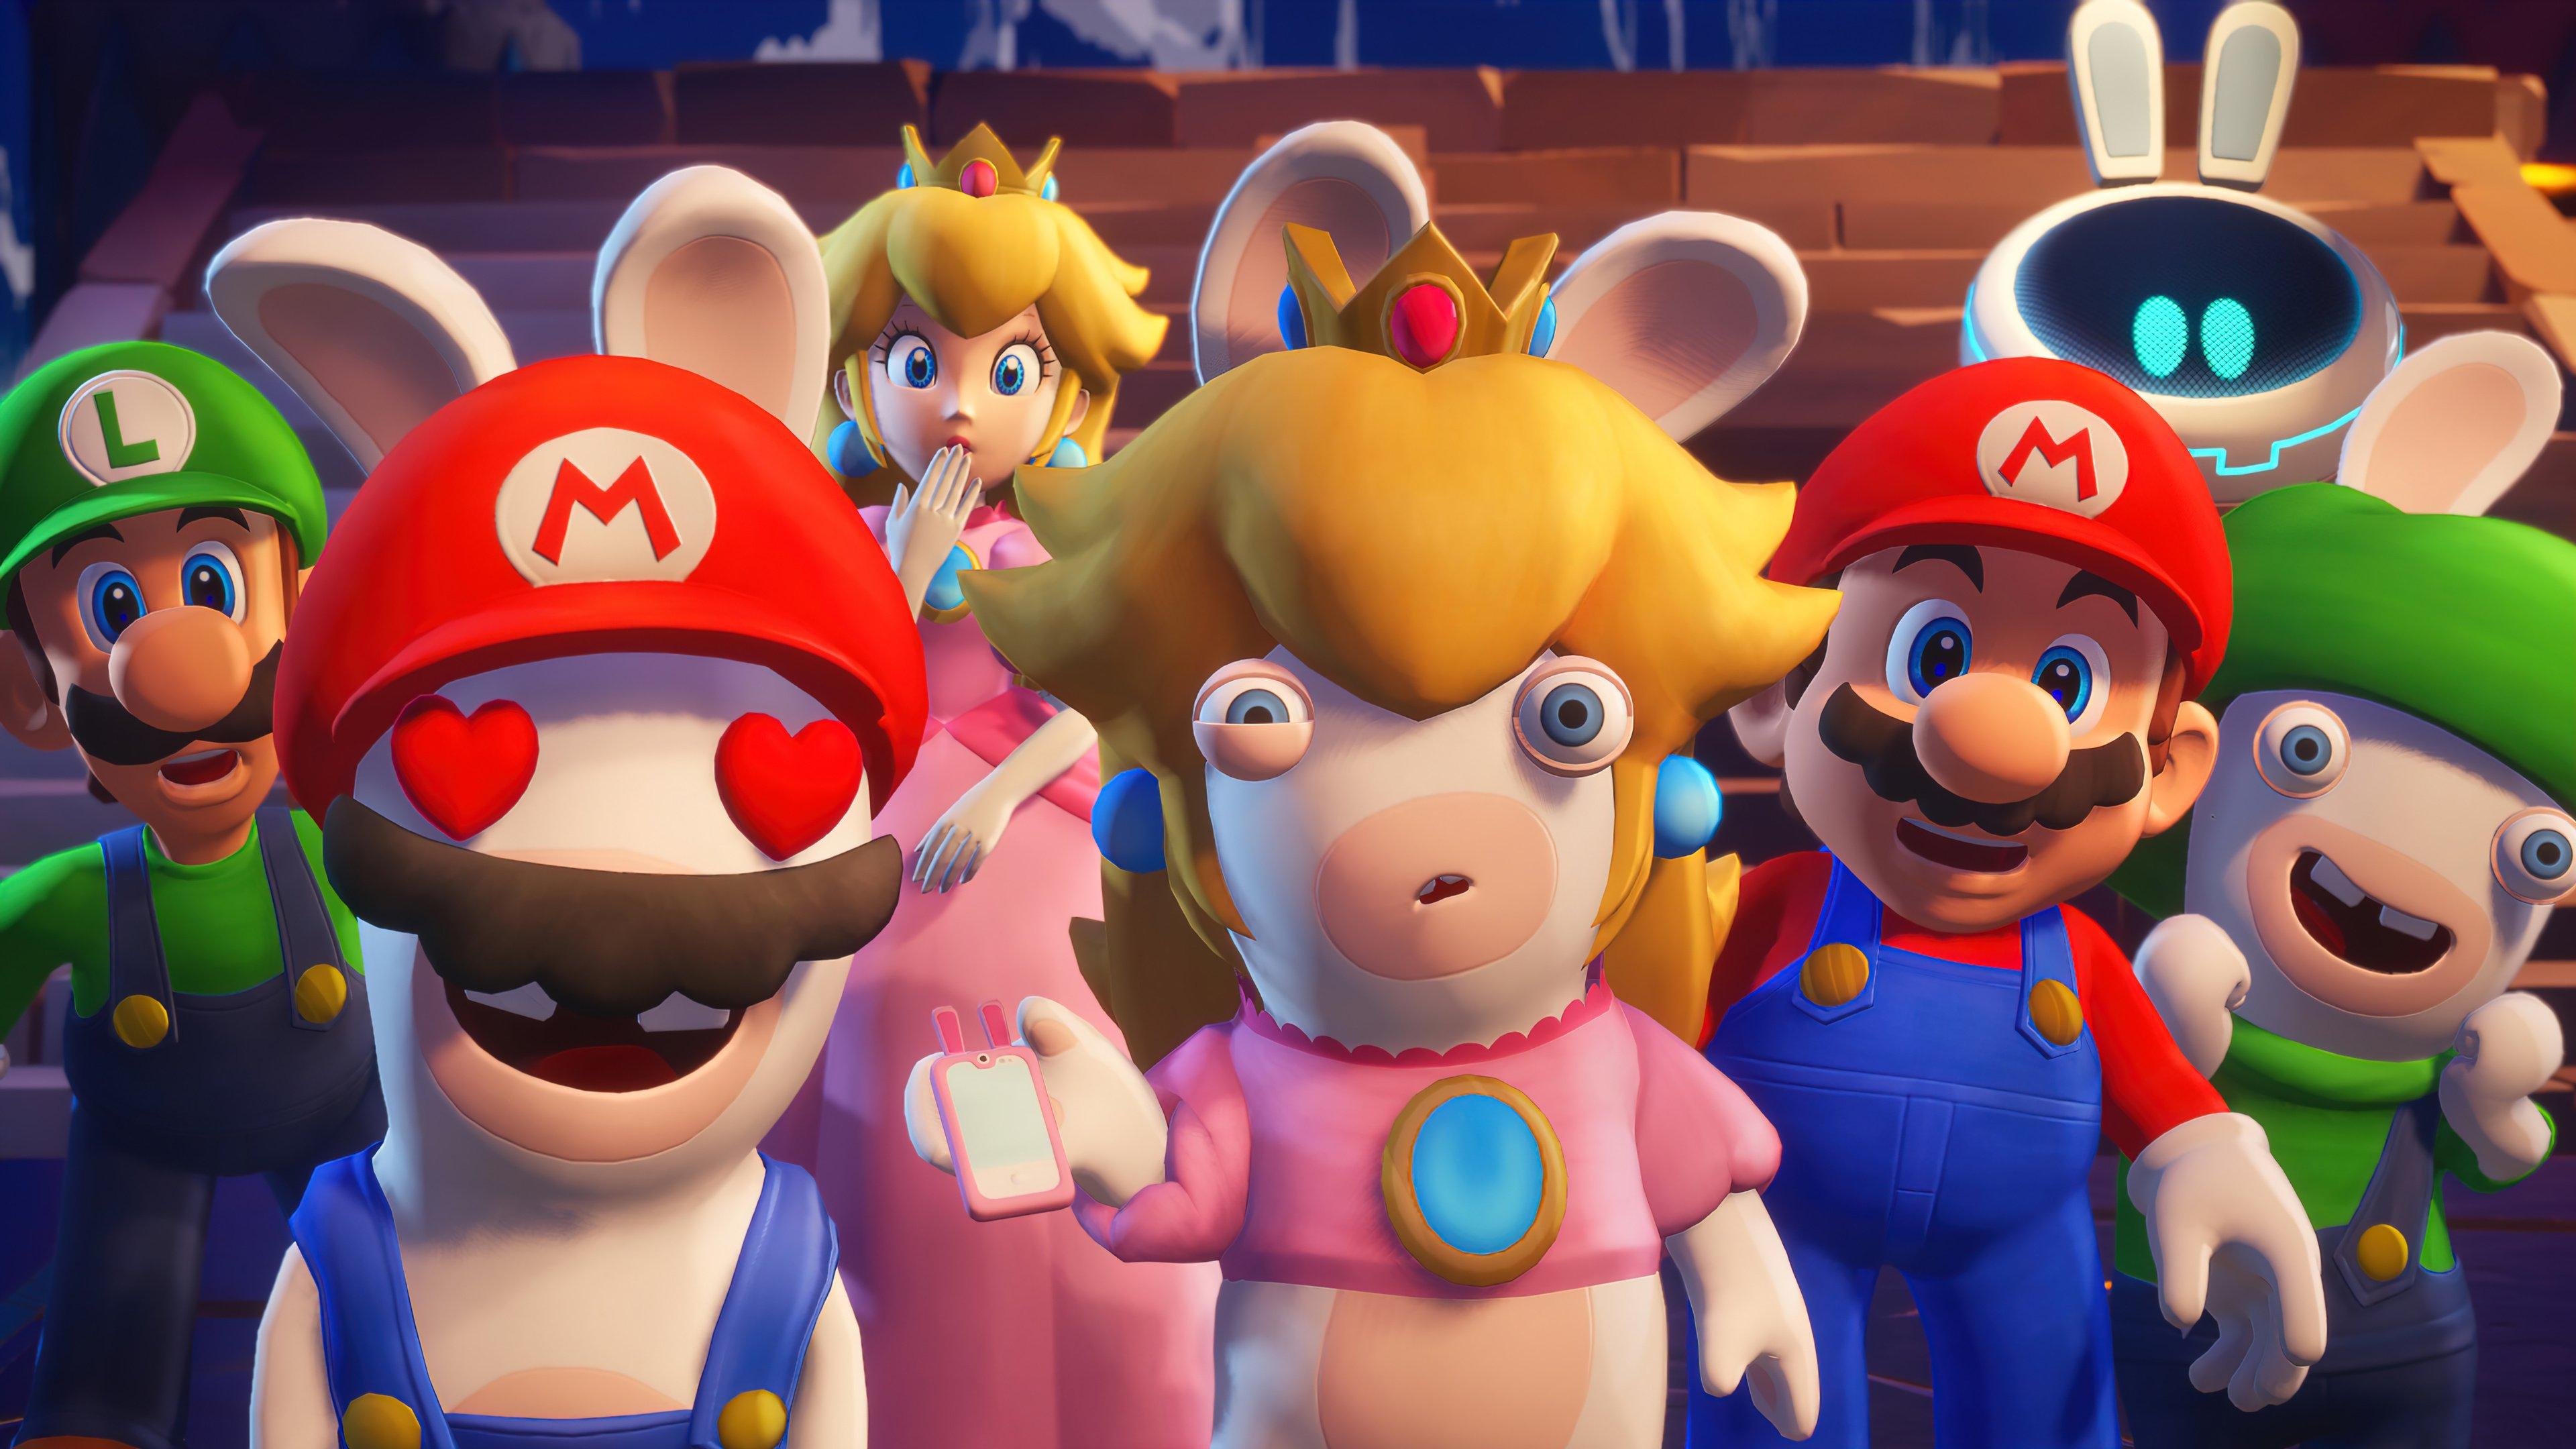 Fondos de pantalla Mario + Rabbids Sparks of Hope